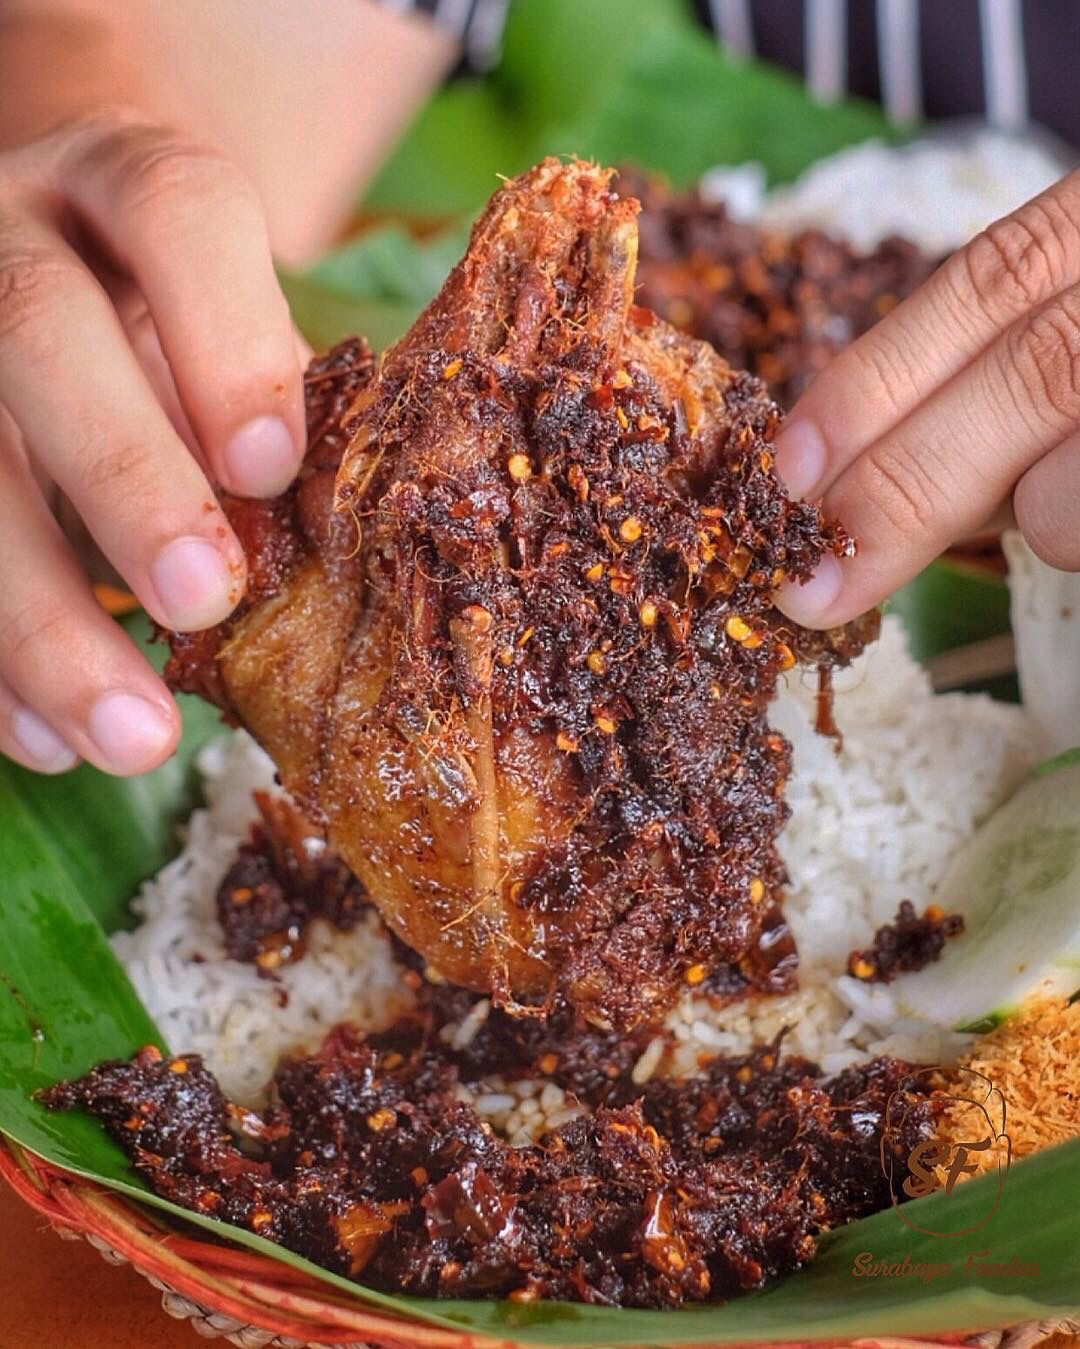 Rekomendasi Wisata Kuliner Makanan Khas Surabaya Jawa Timur